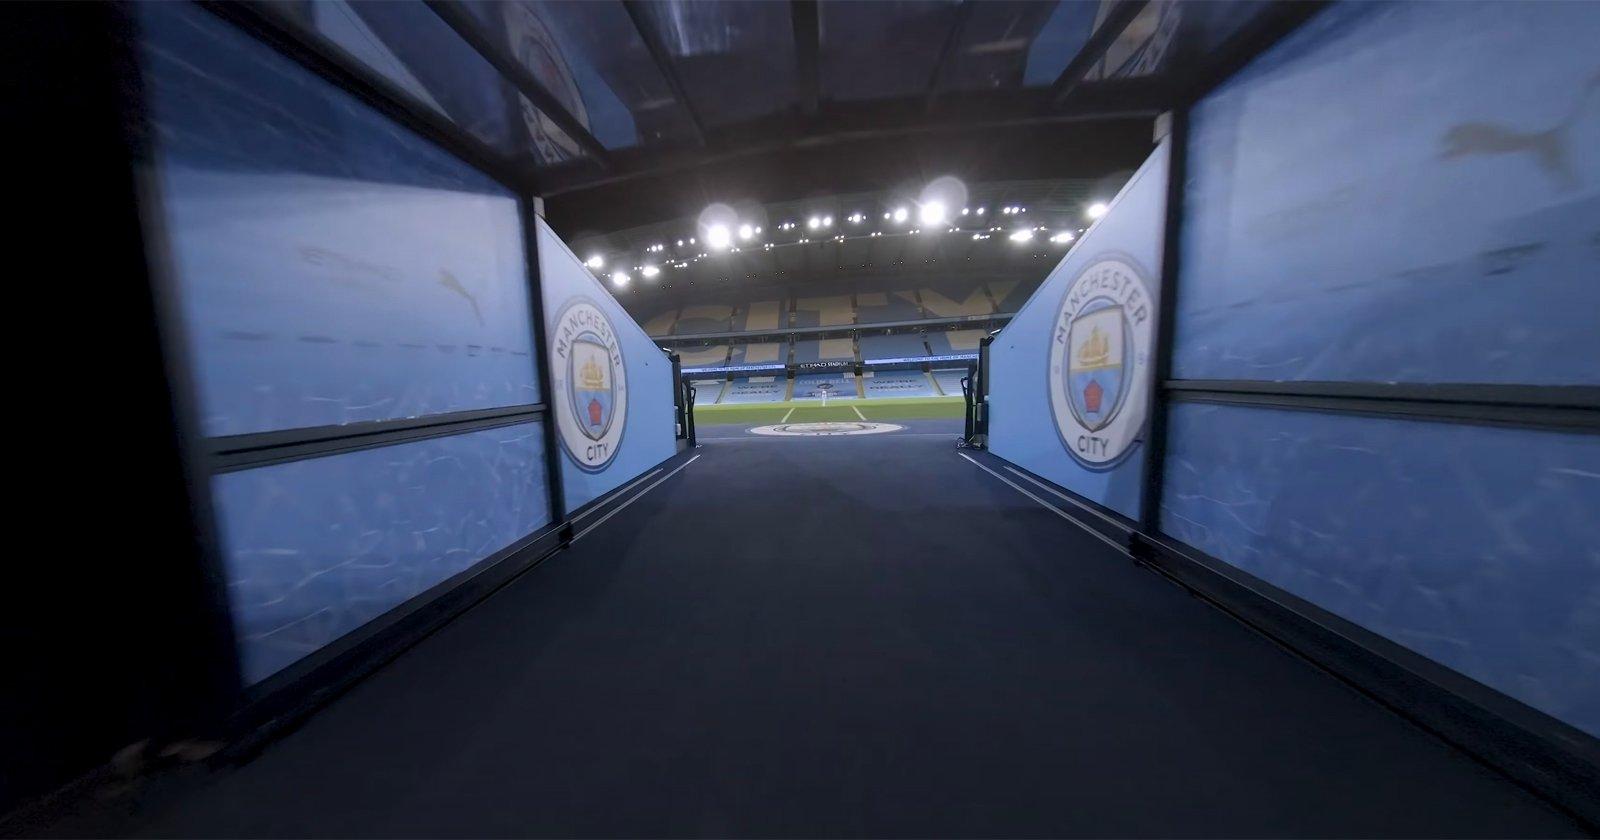 Stunning Single-Shot FPV Drone Tour of Manchester City's Etihad Stadium